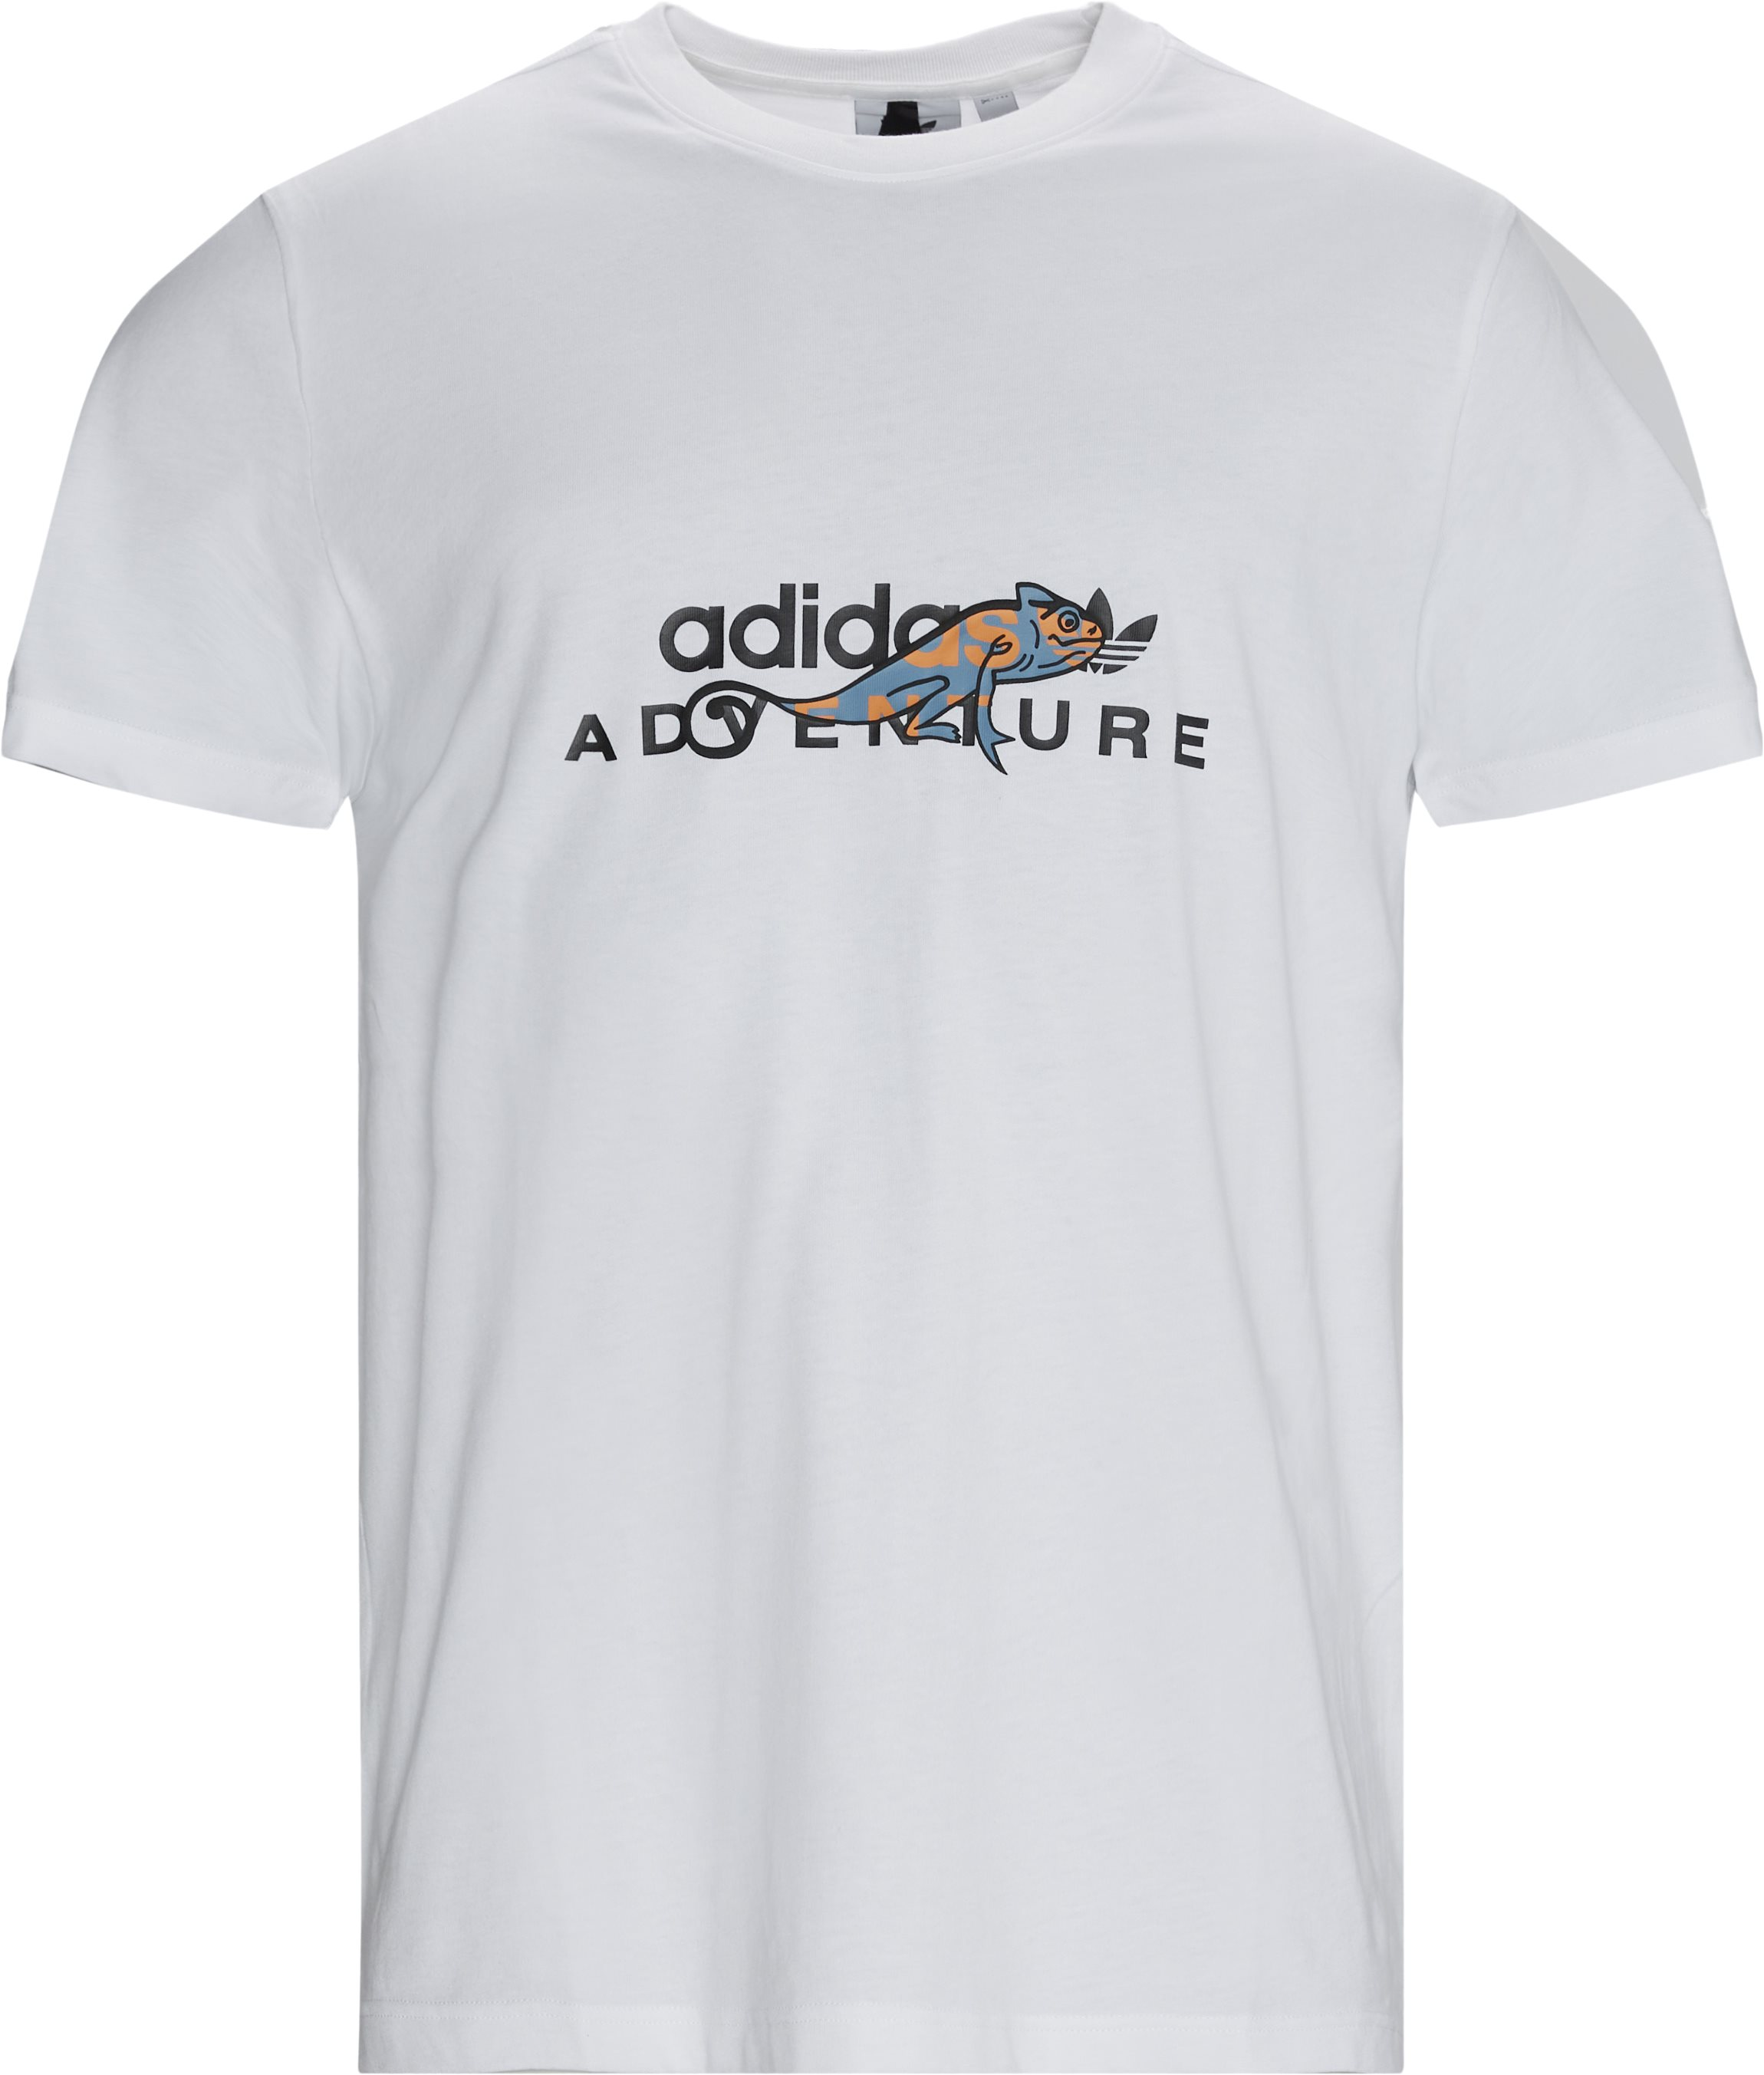 ADV Tee - T-shirts - Regular - Hvid